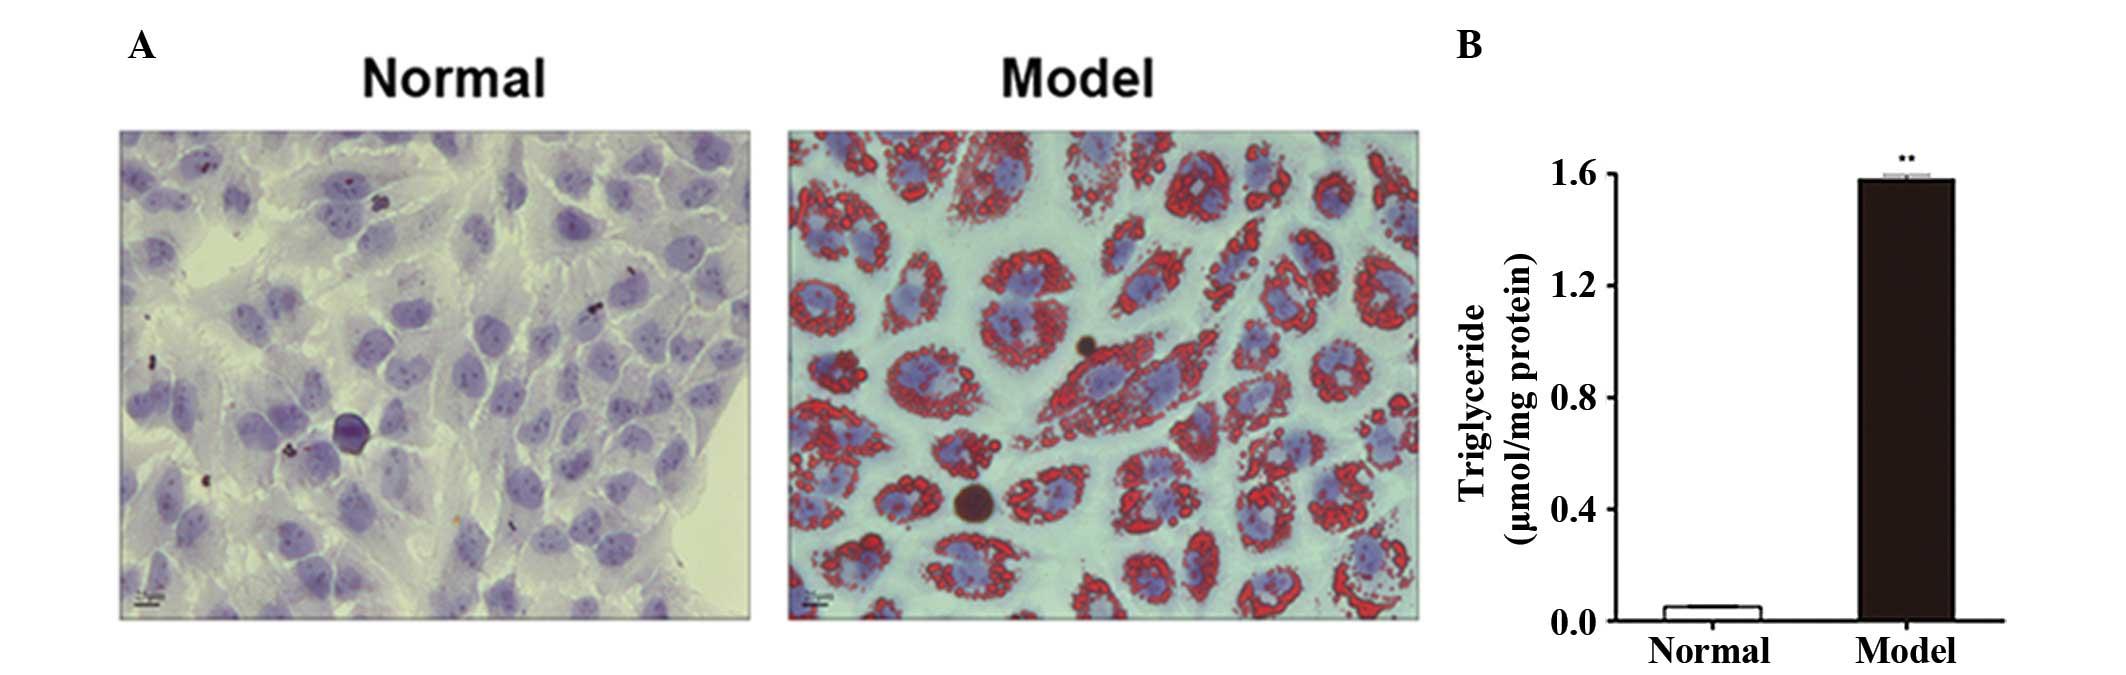 Liraglutide Reduces Lipid Accumulation In Steatotic L‑02